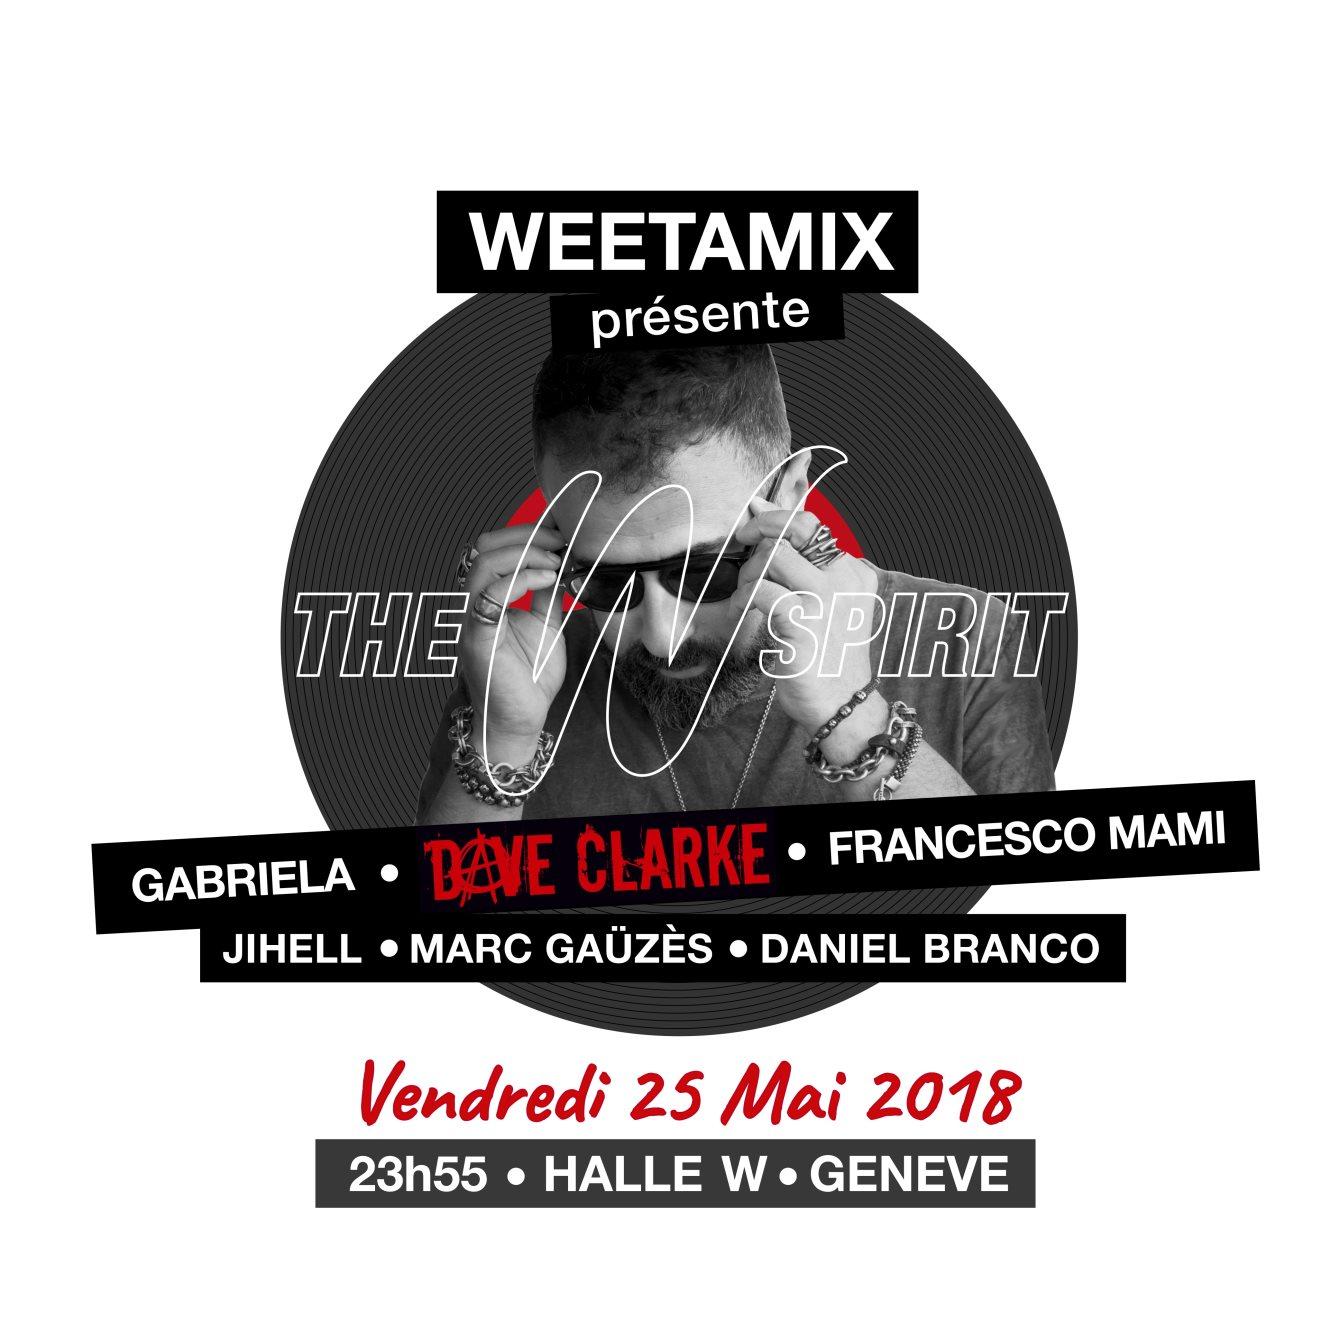 Weetamix presents: The W Spirit Part #4 with Dave Clarke - Flyer front